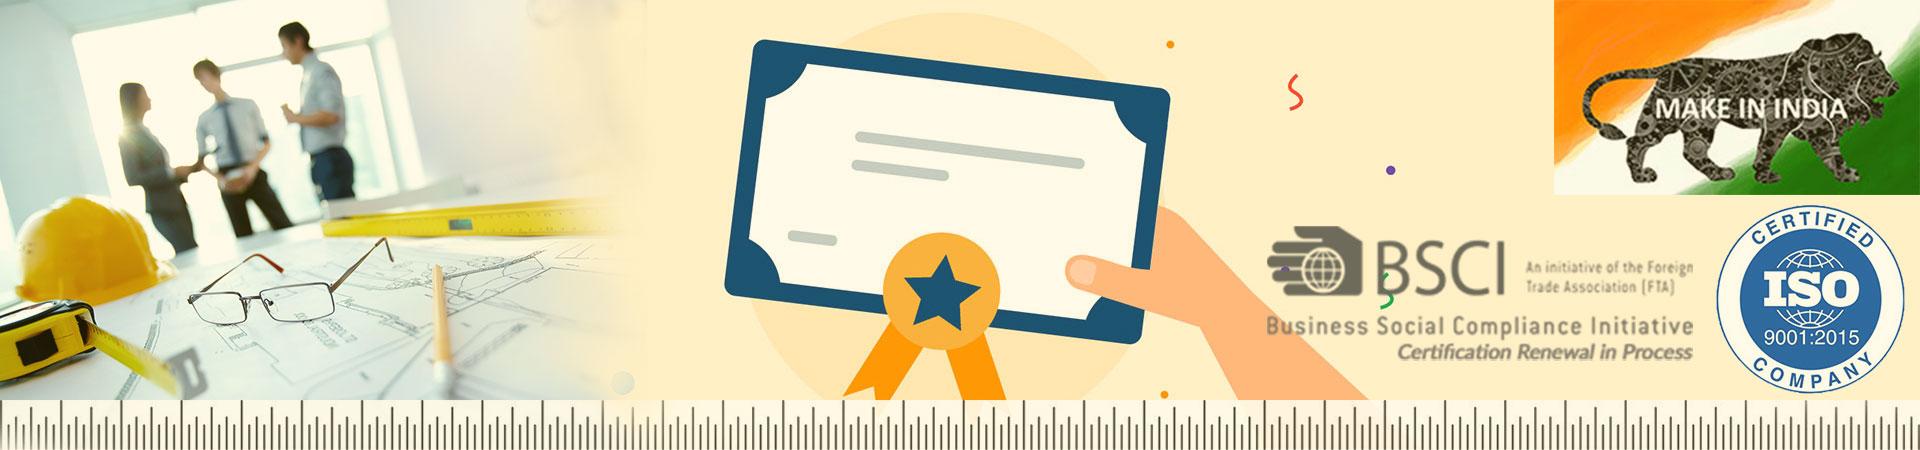 certification-banner-img1